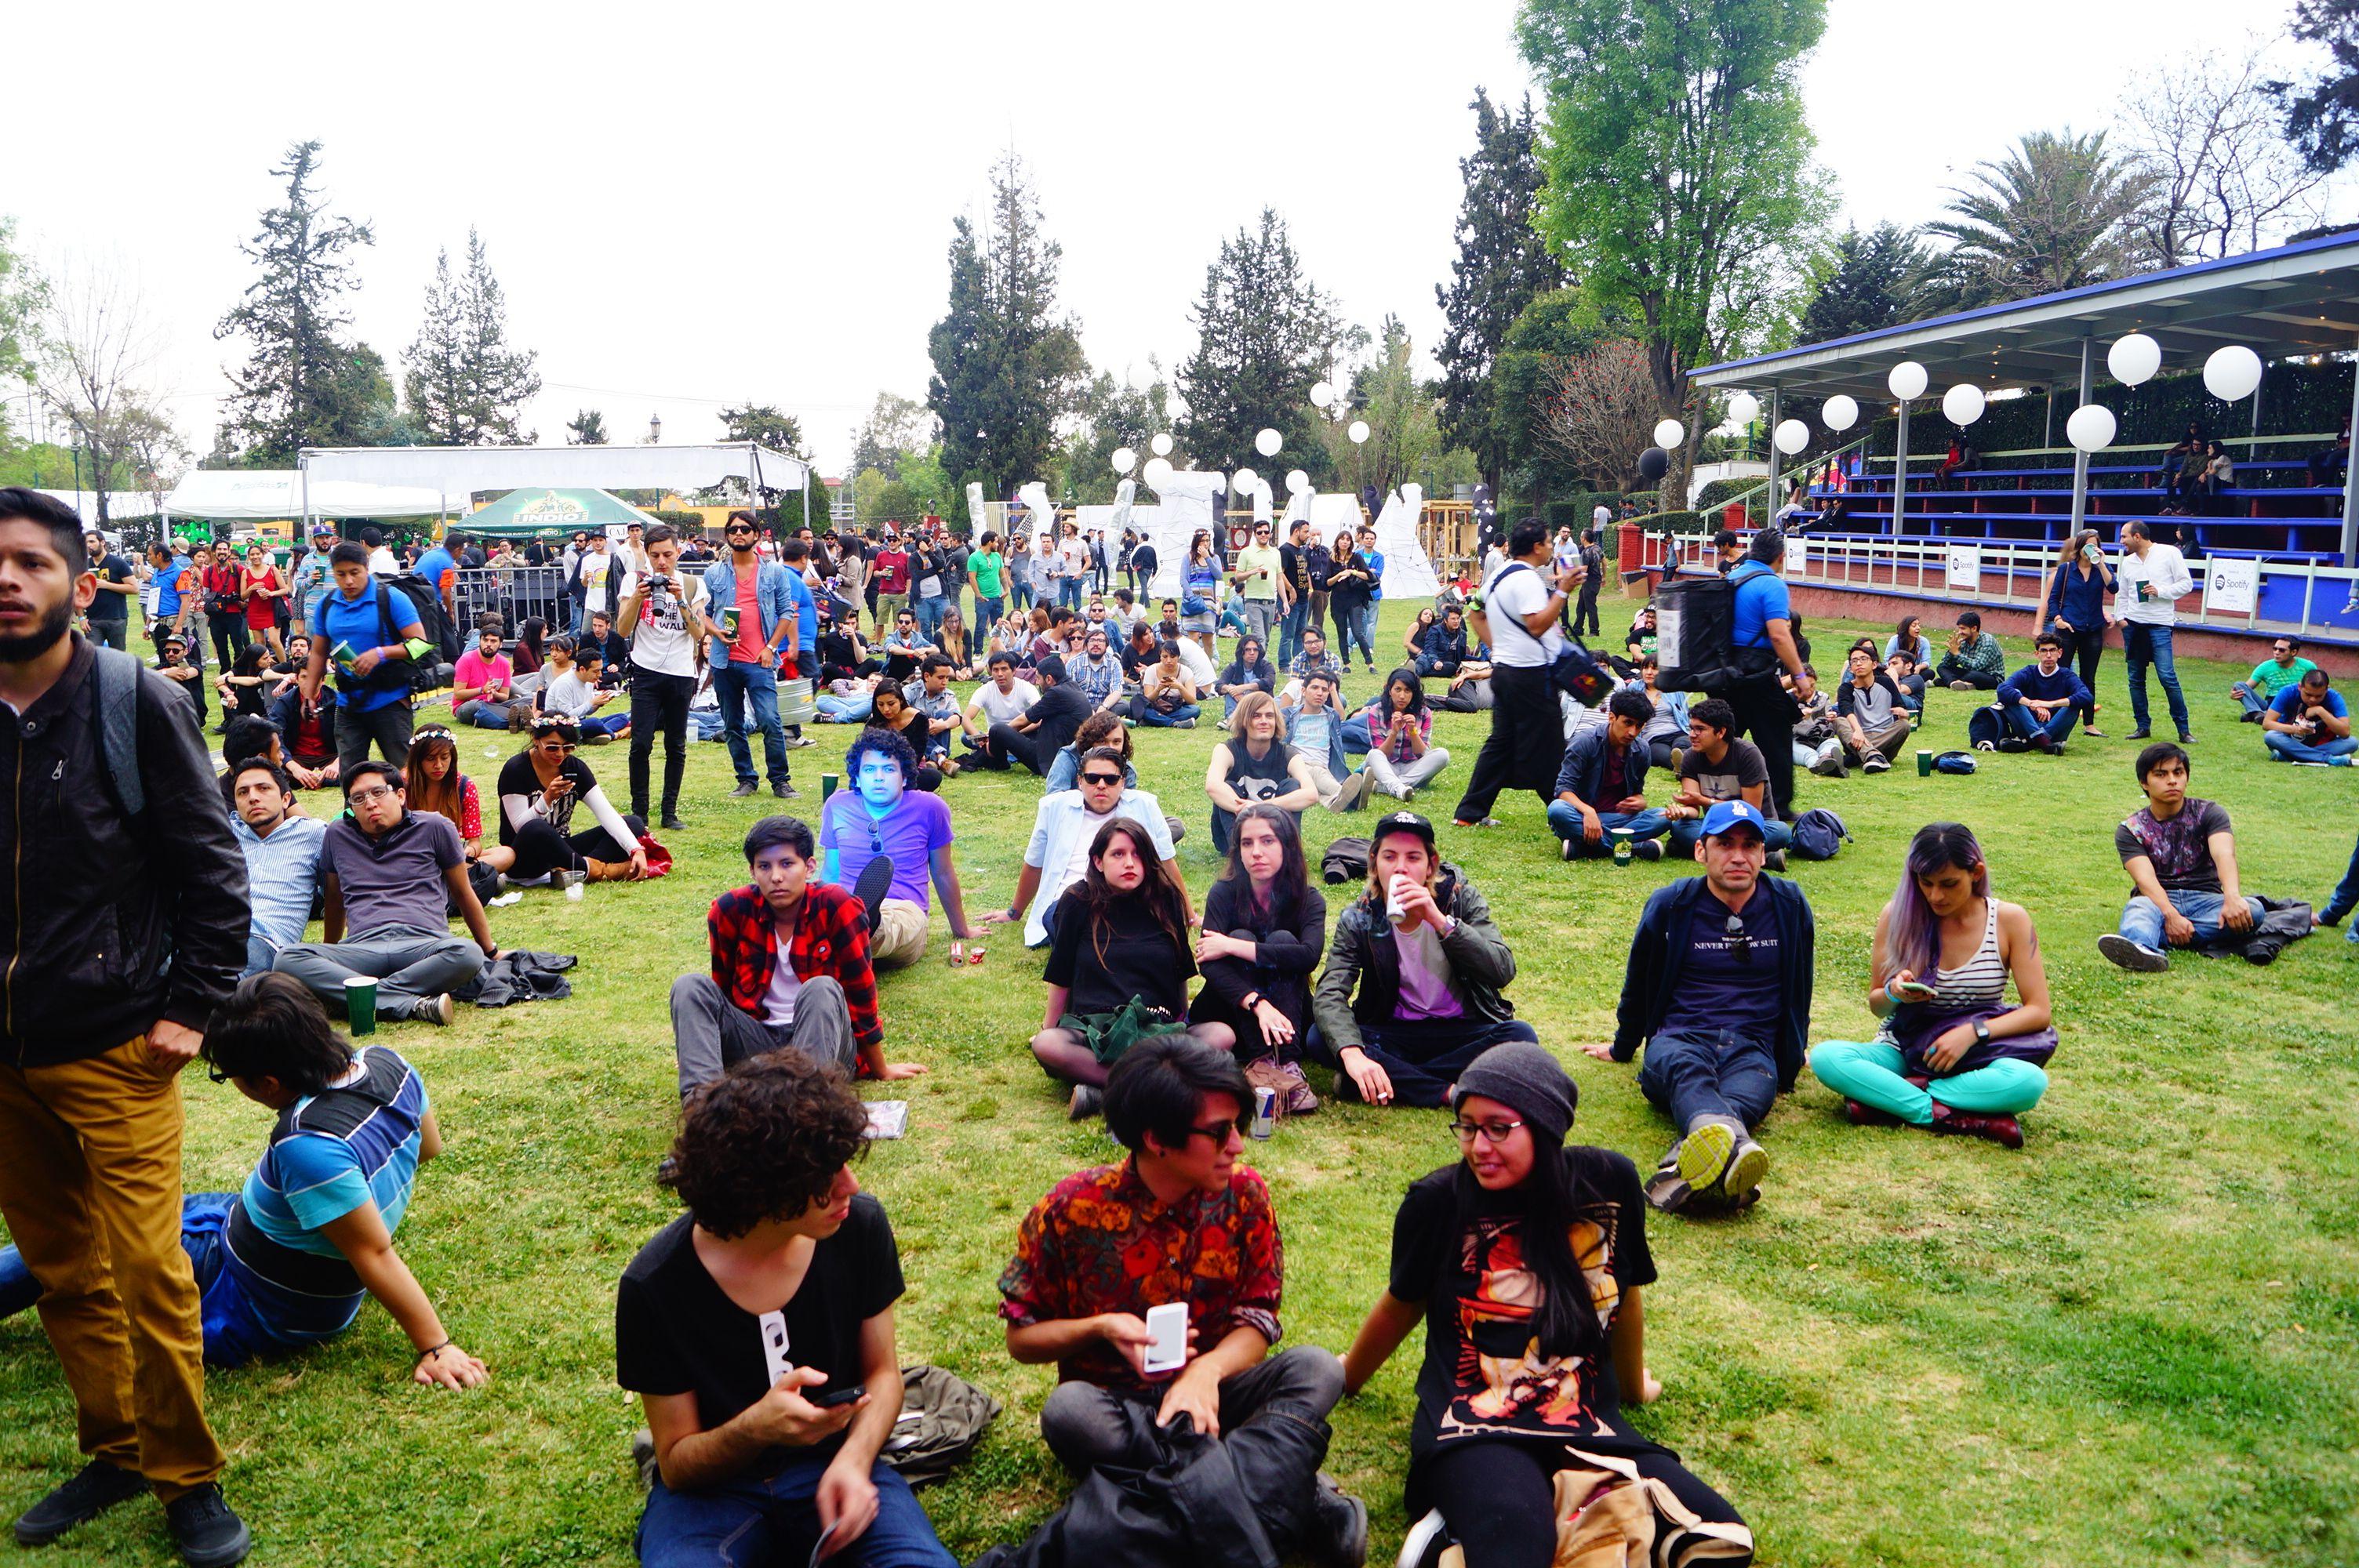 #ISenNrmal: Foto del #FestivalNrmal Por: Marcos Zarate Martinez